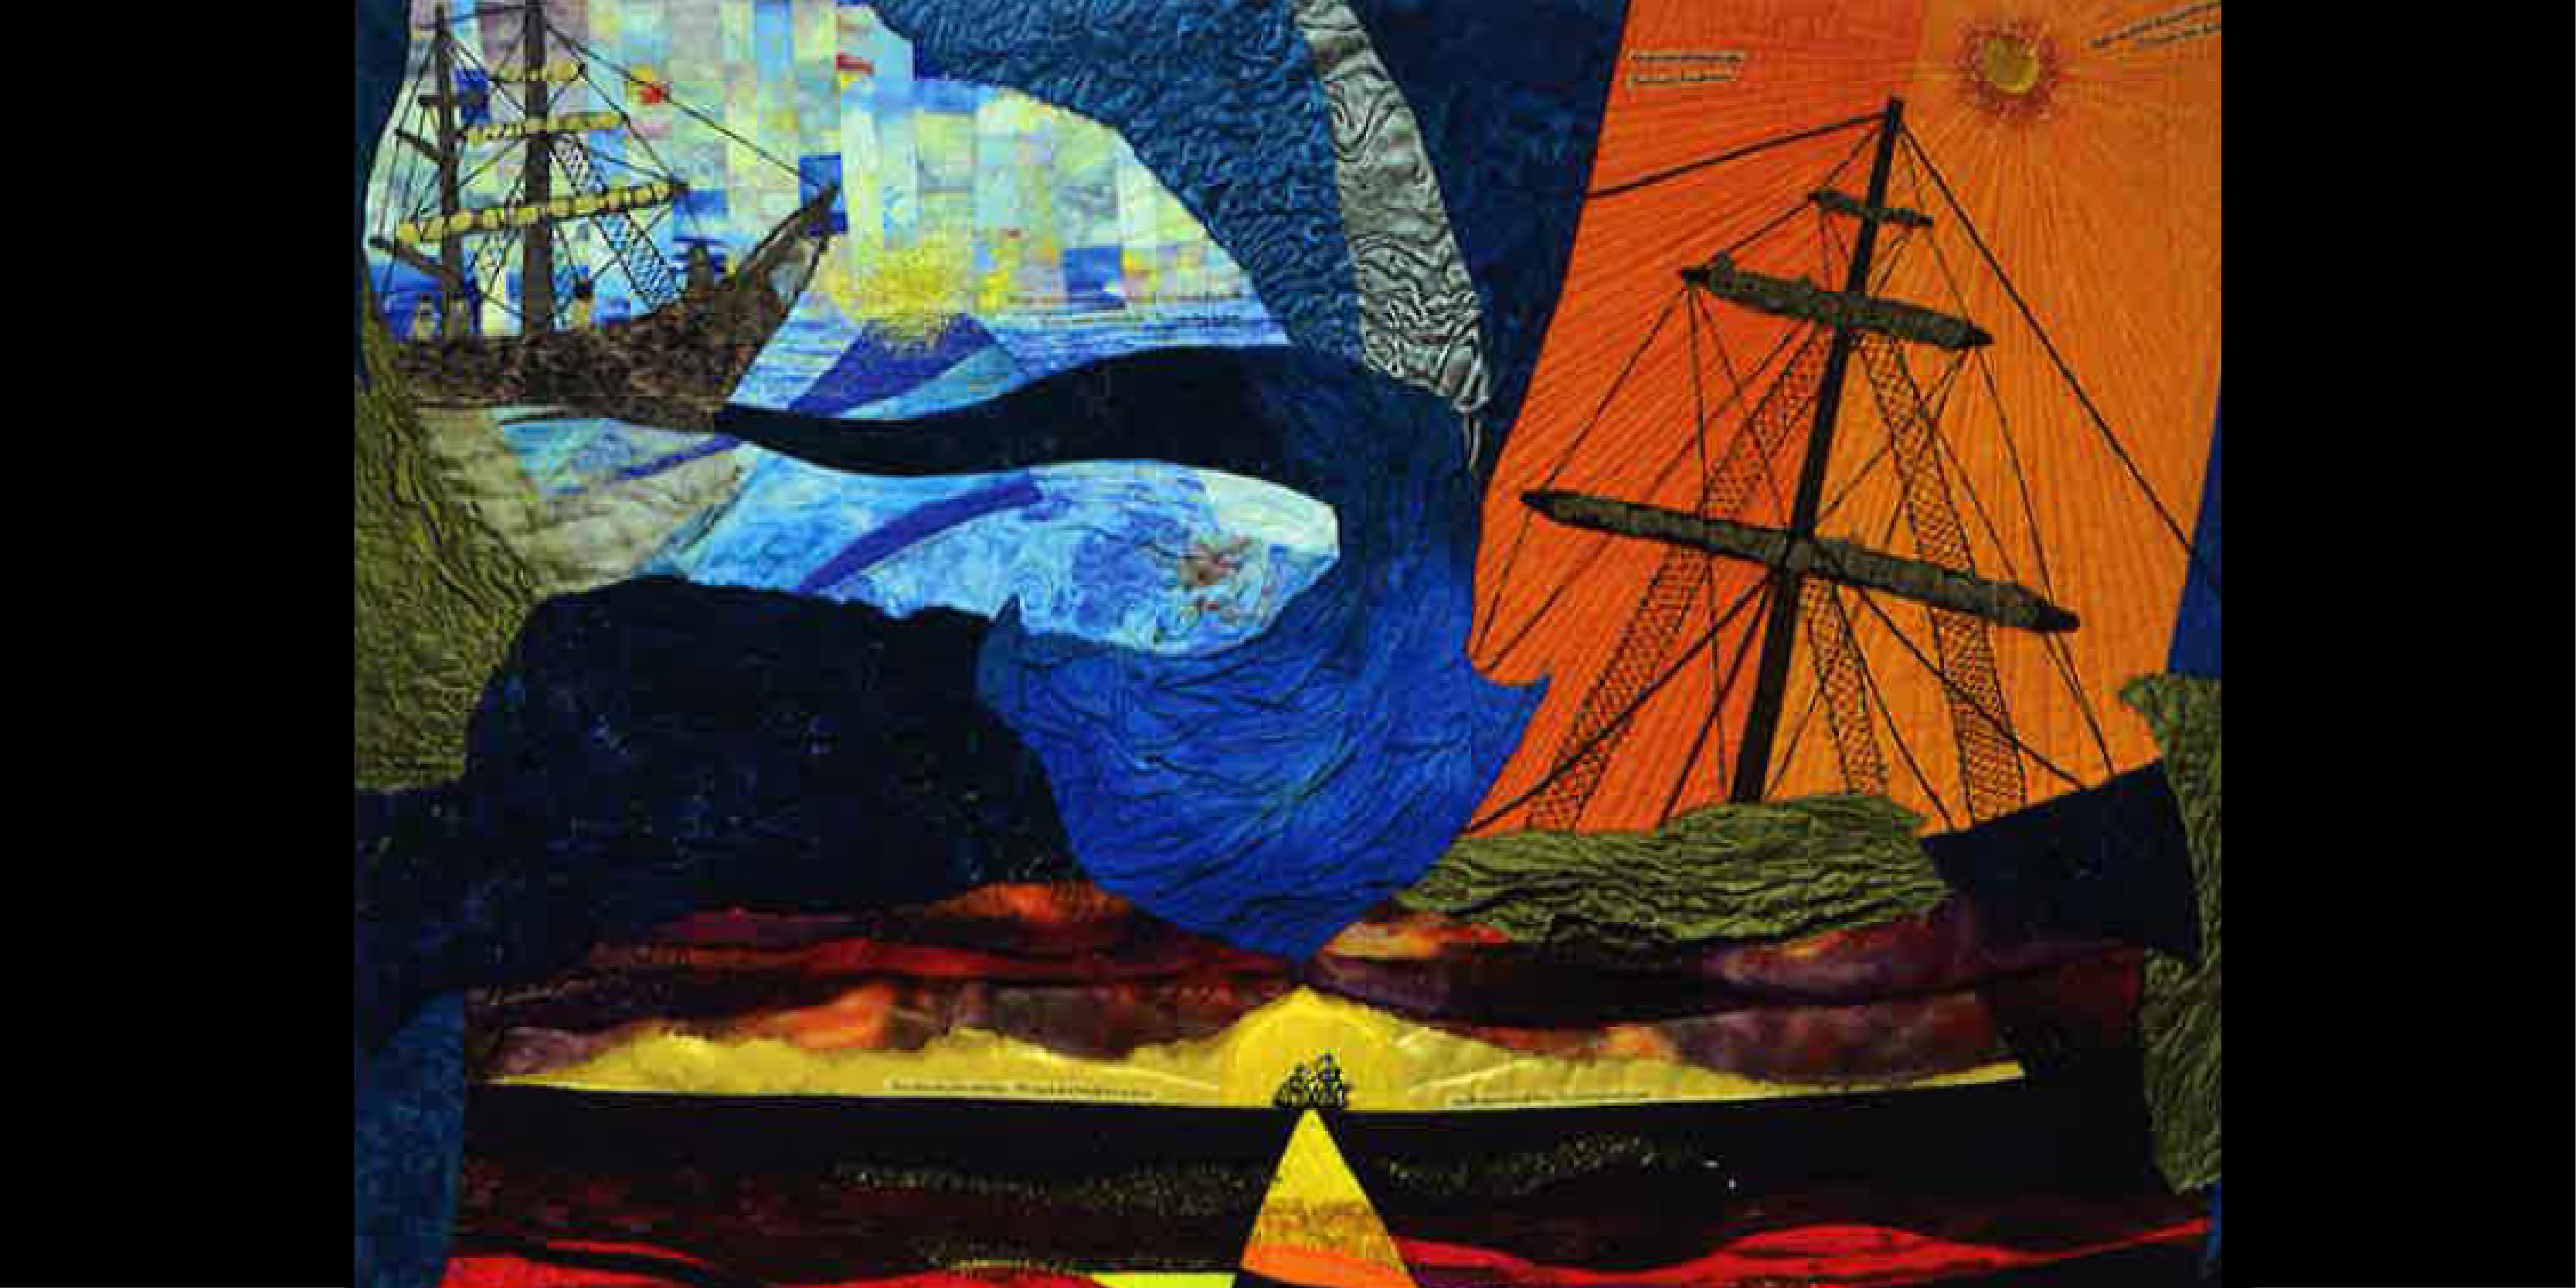 textile art depicting ships on an ocean